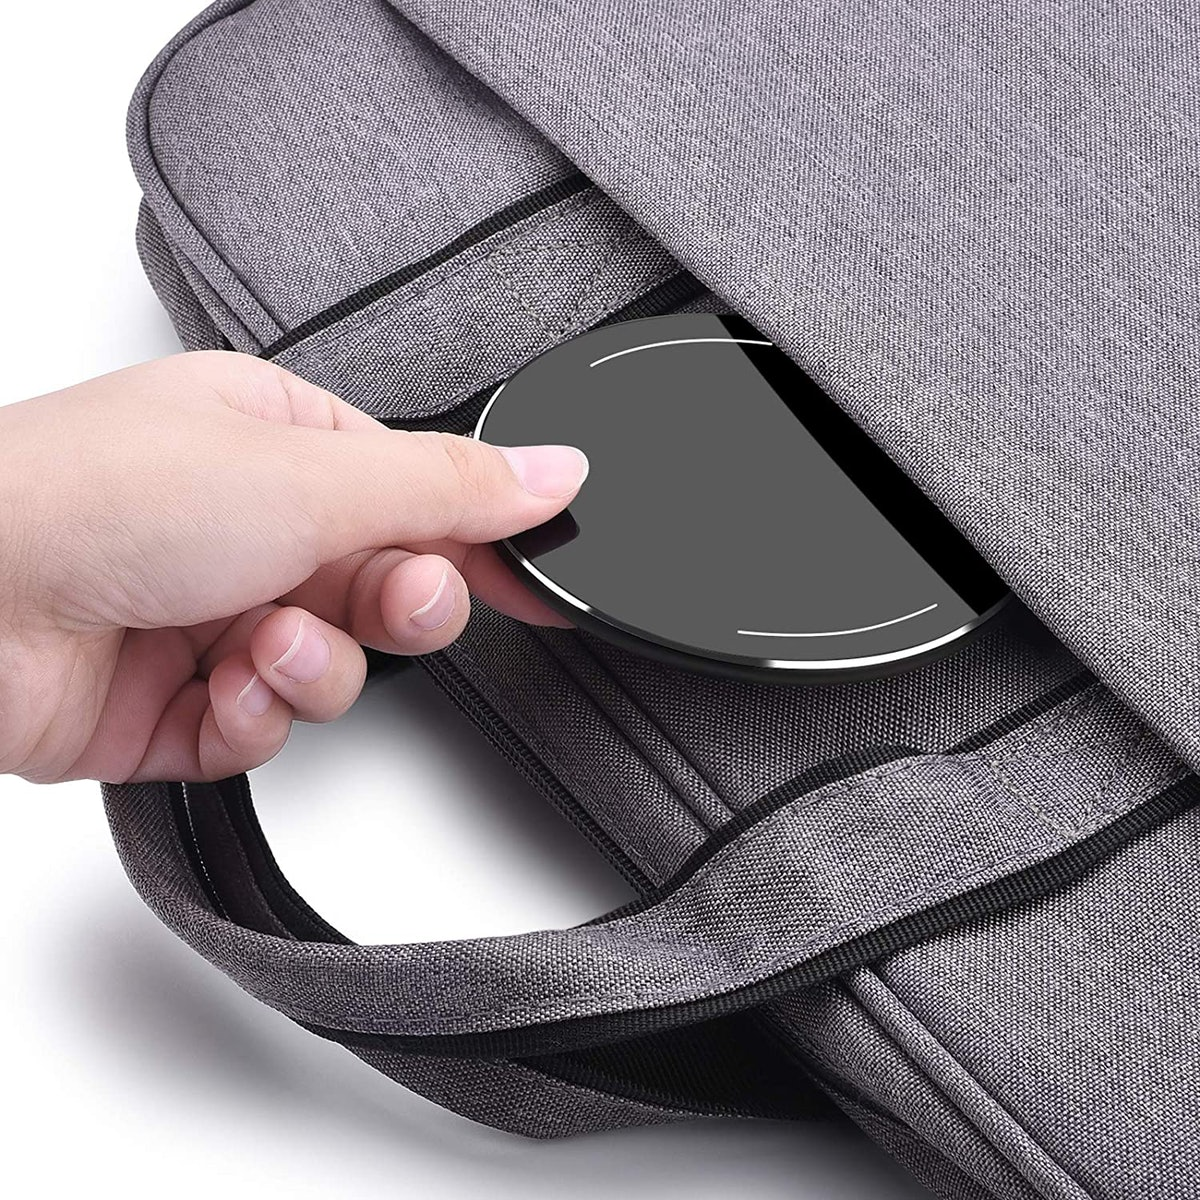 TOZO W1 Wireless Thin Charging Pad